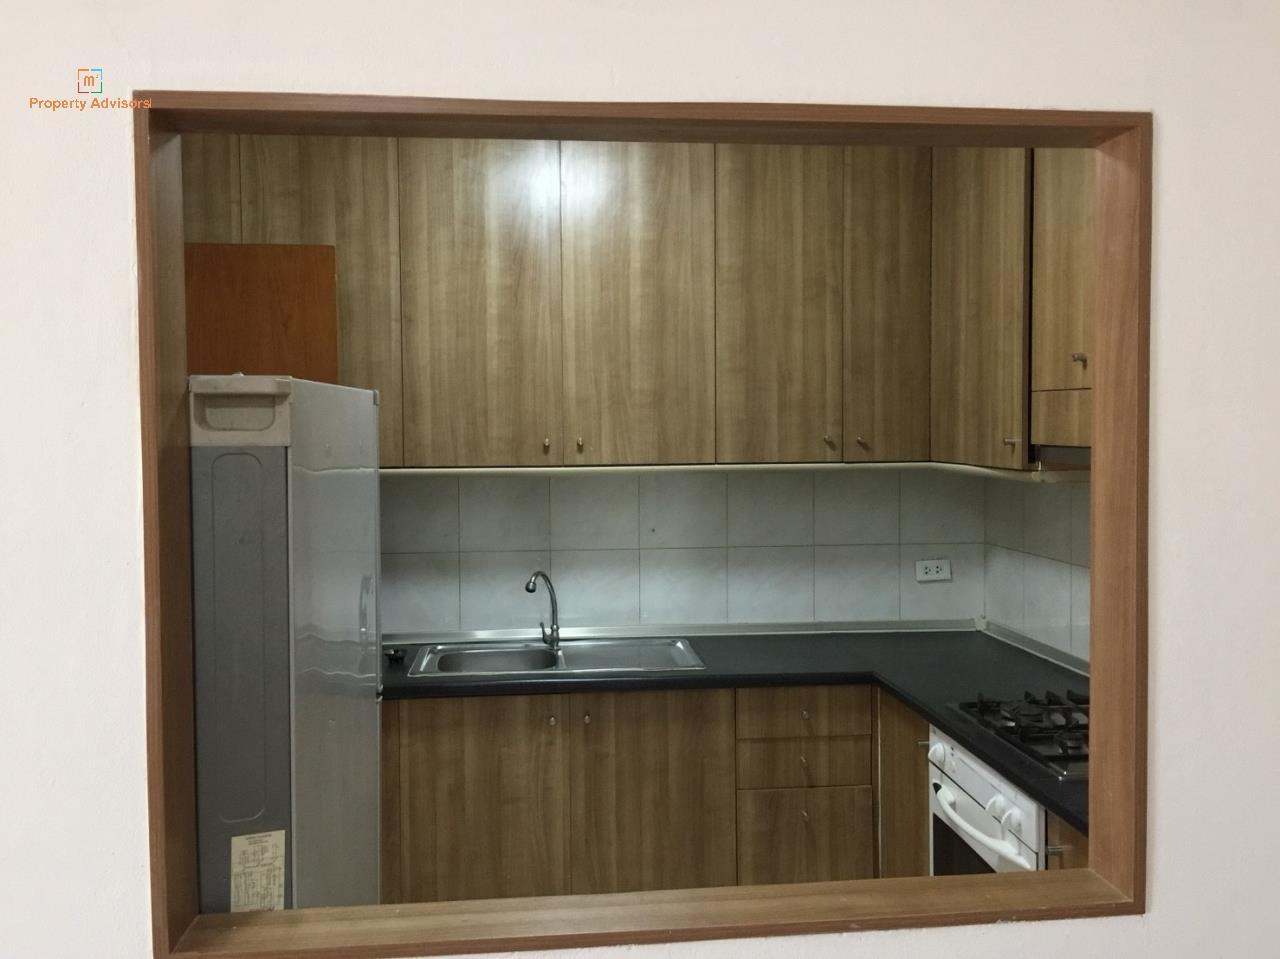 m2 Property Advisors Agency's Liberty ParkII Sukhumvit 11 10